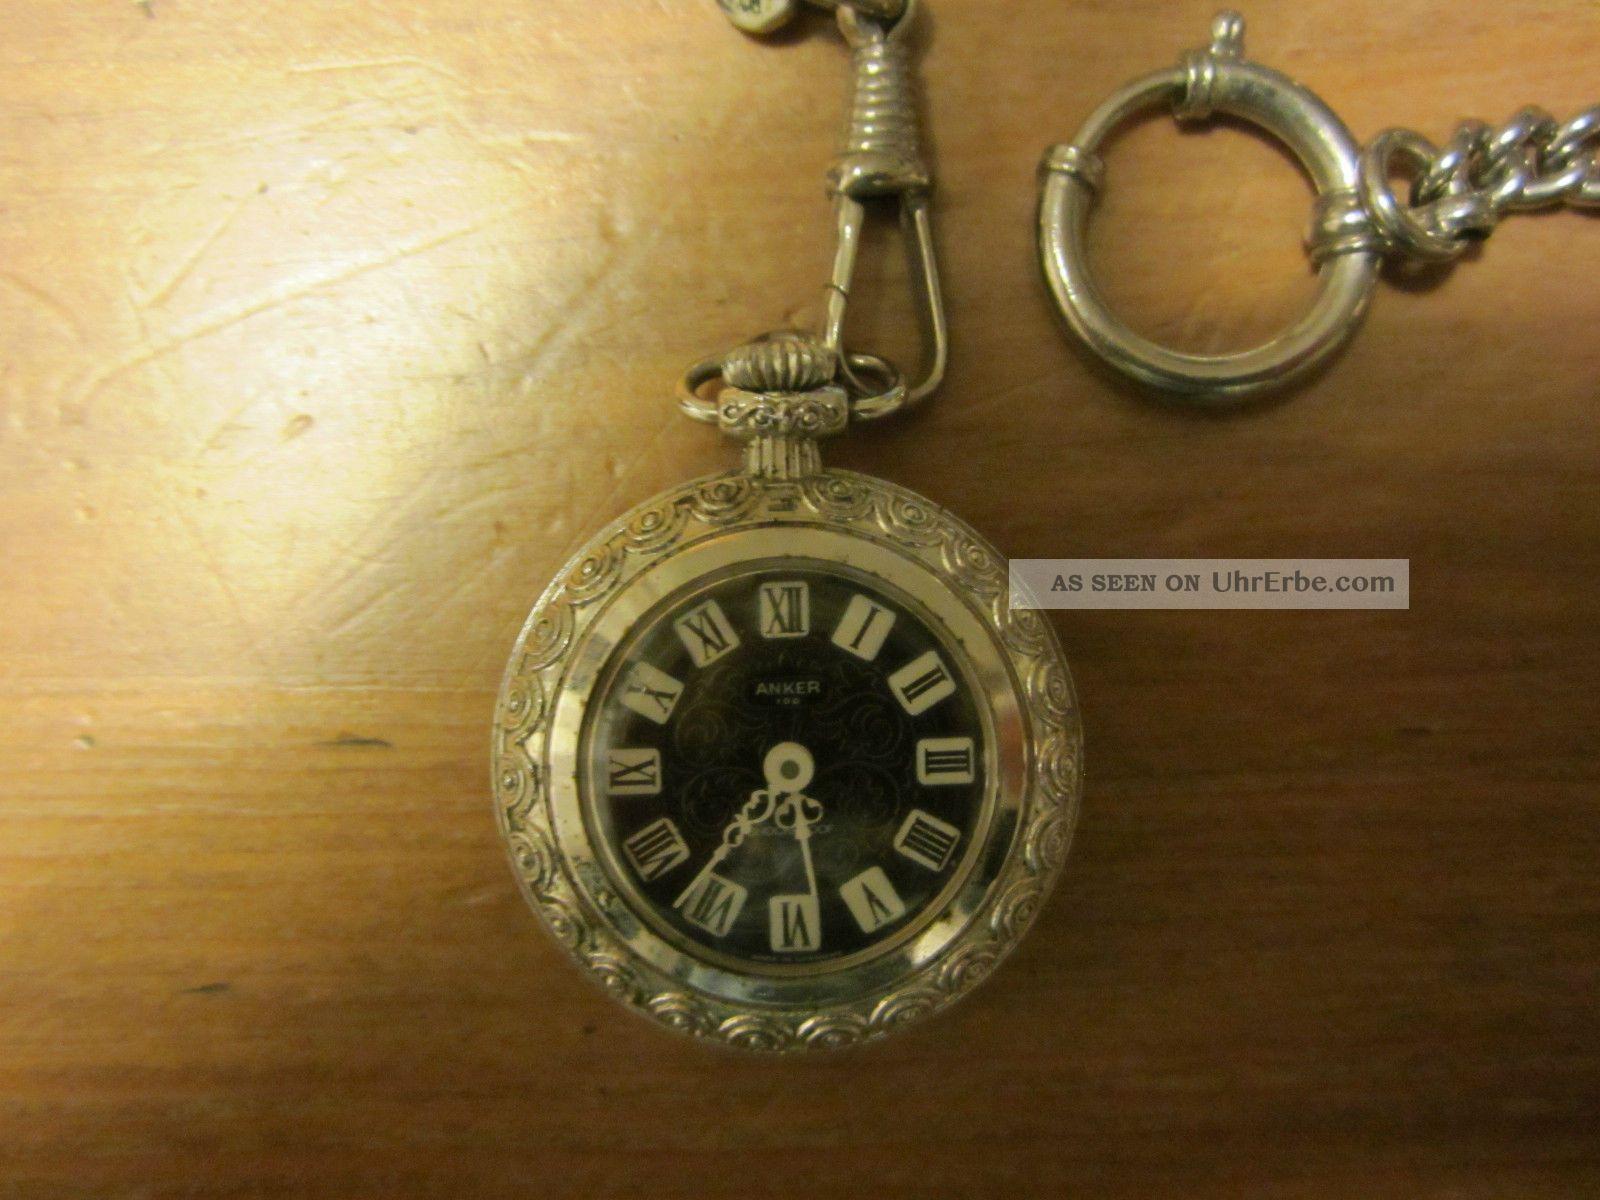 Taschenuhr Armbanduhren Bild